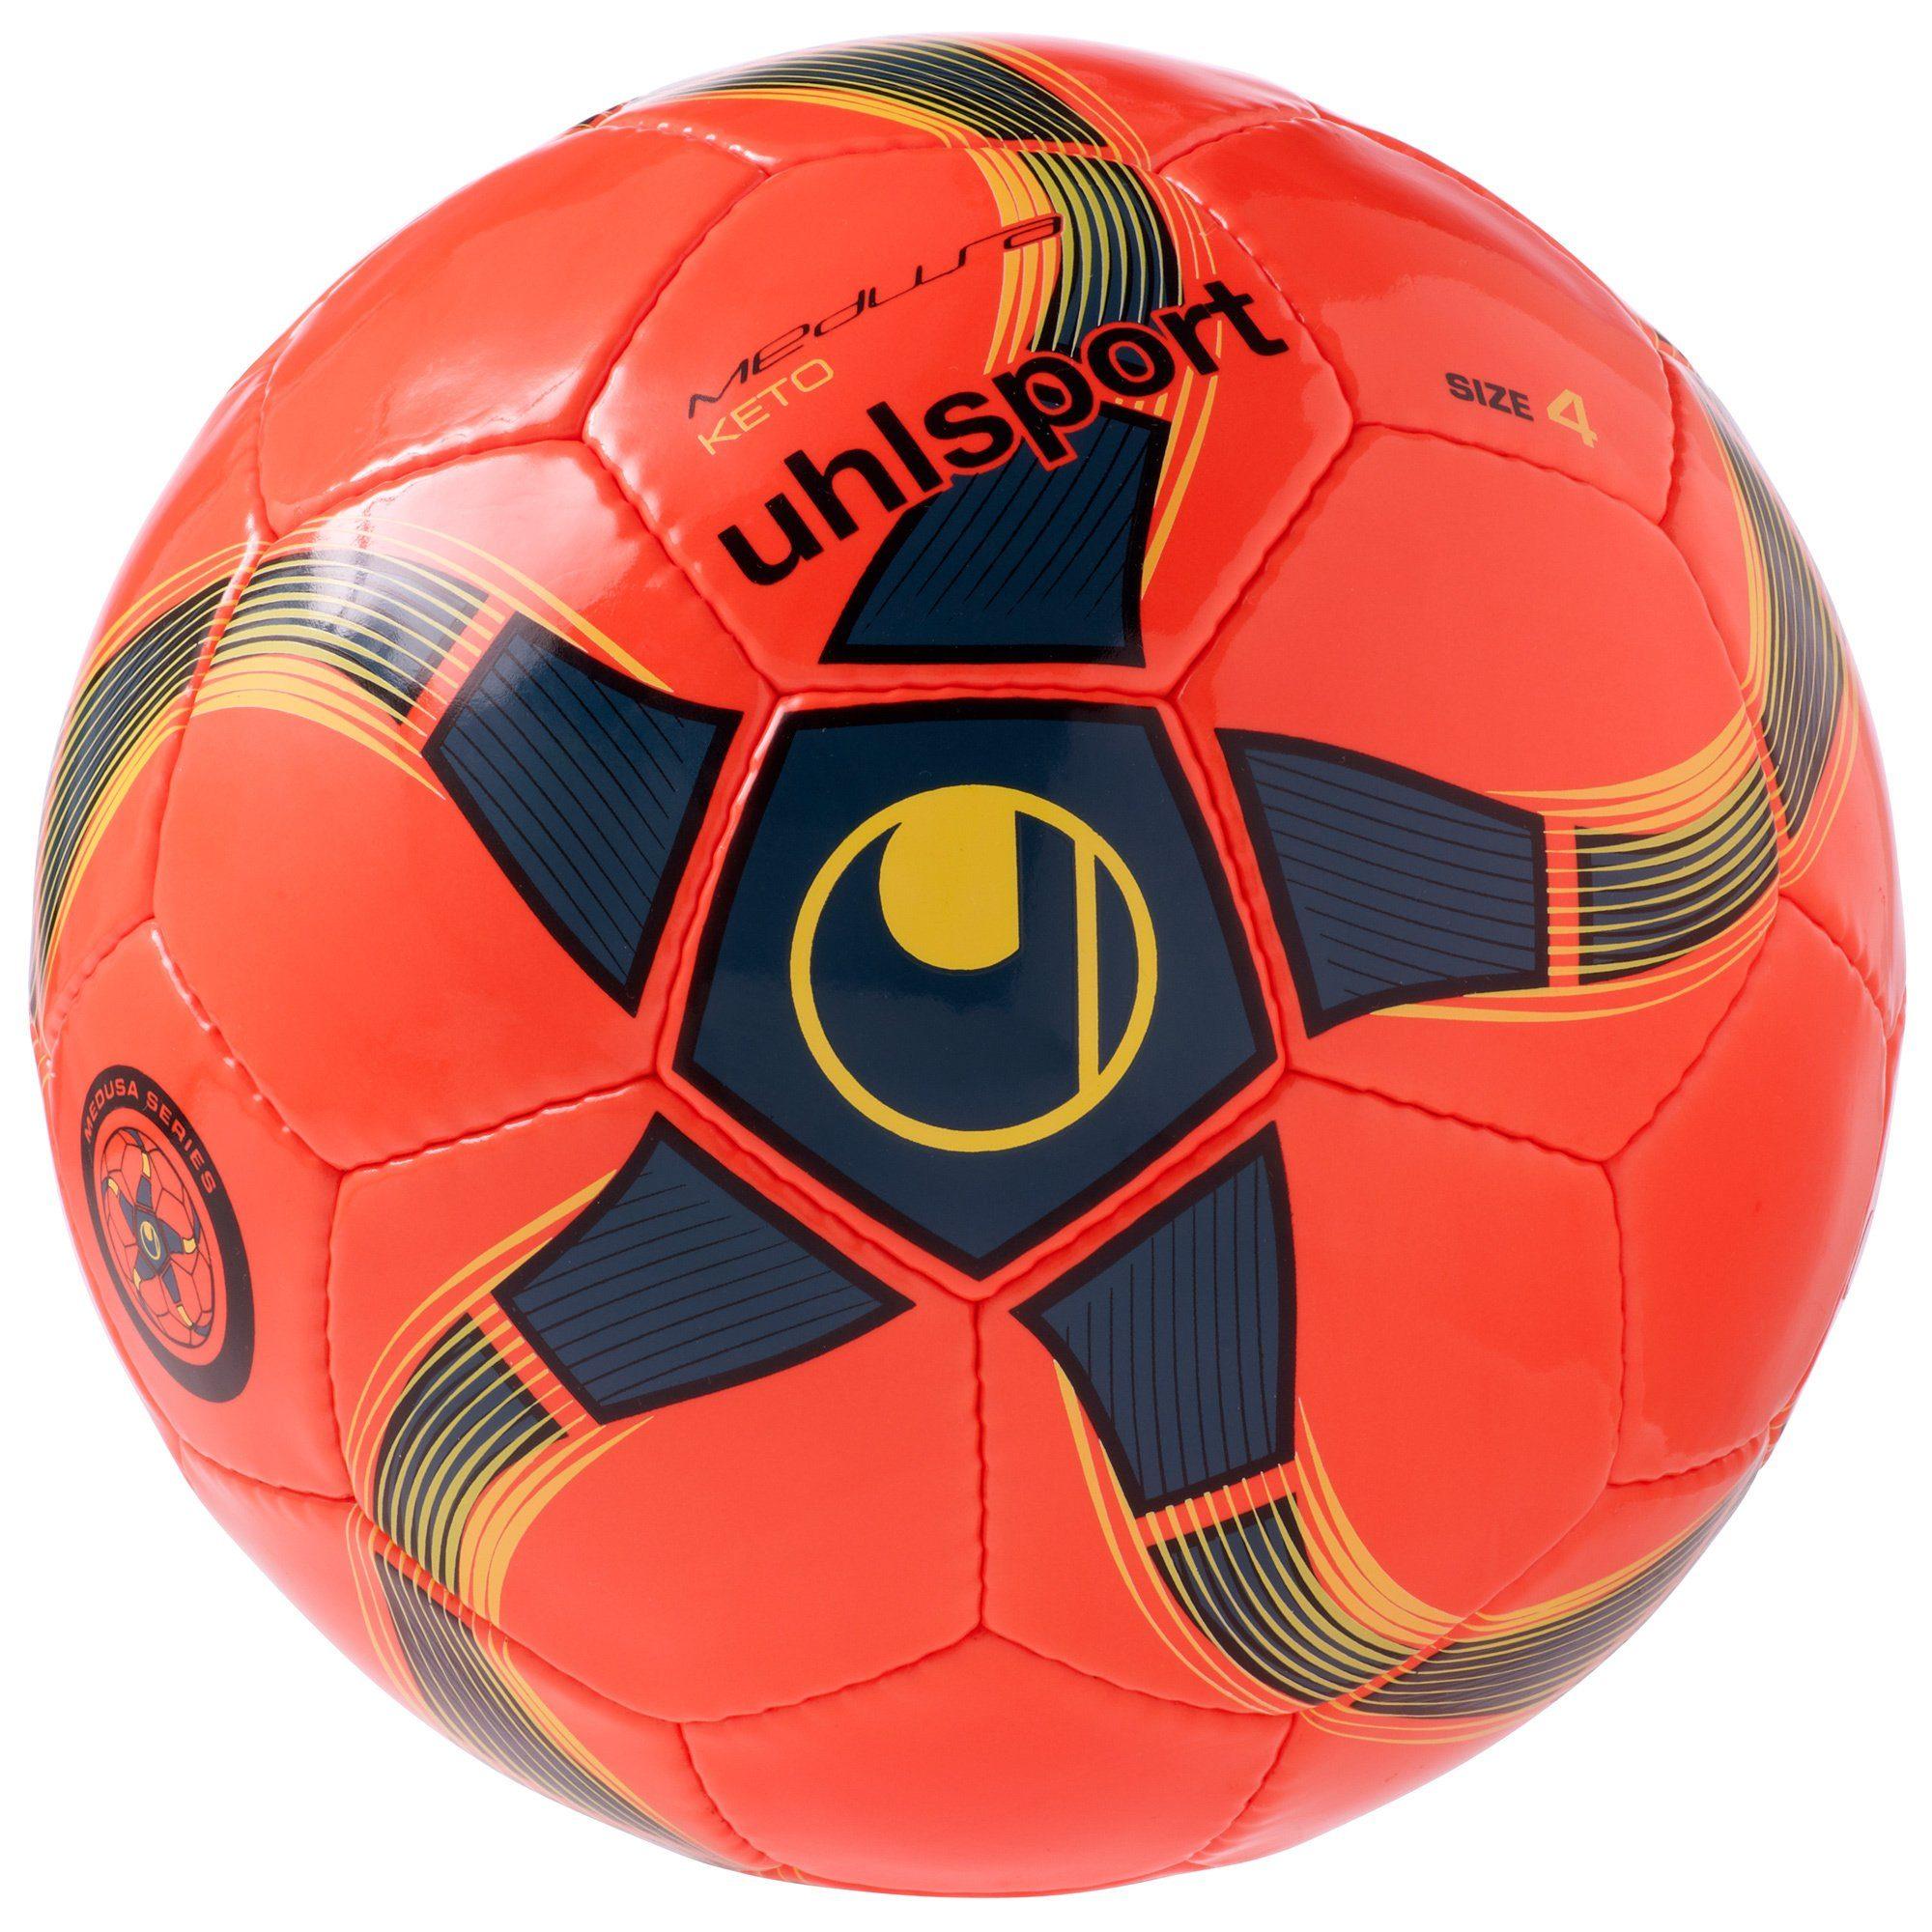 UHLSPORT Medusa Keto Fußball